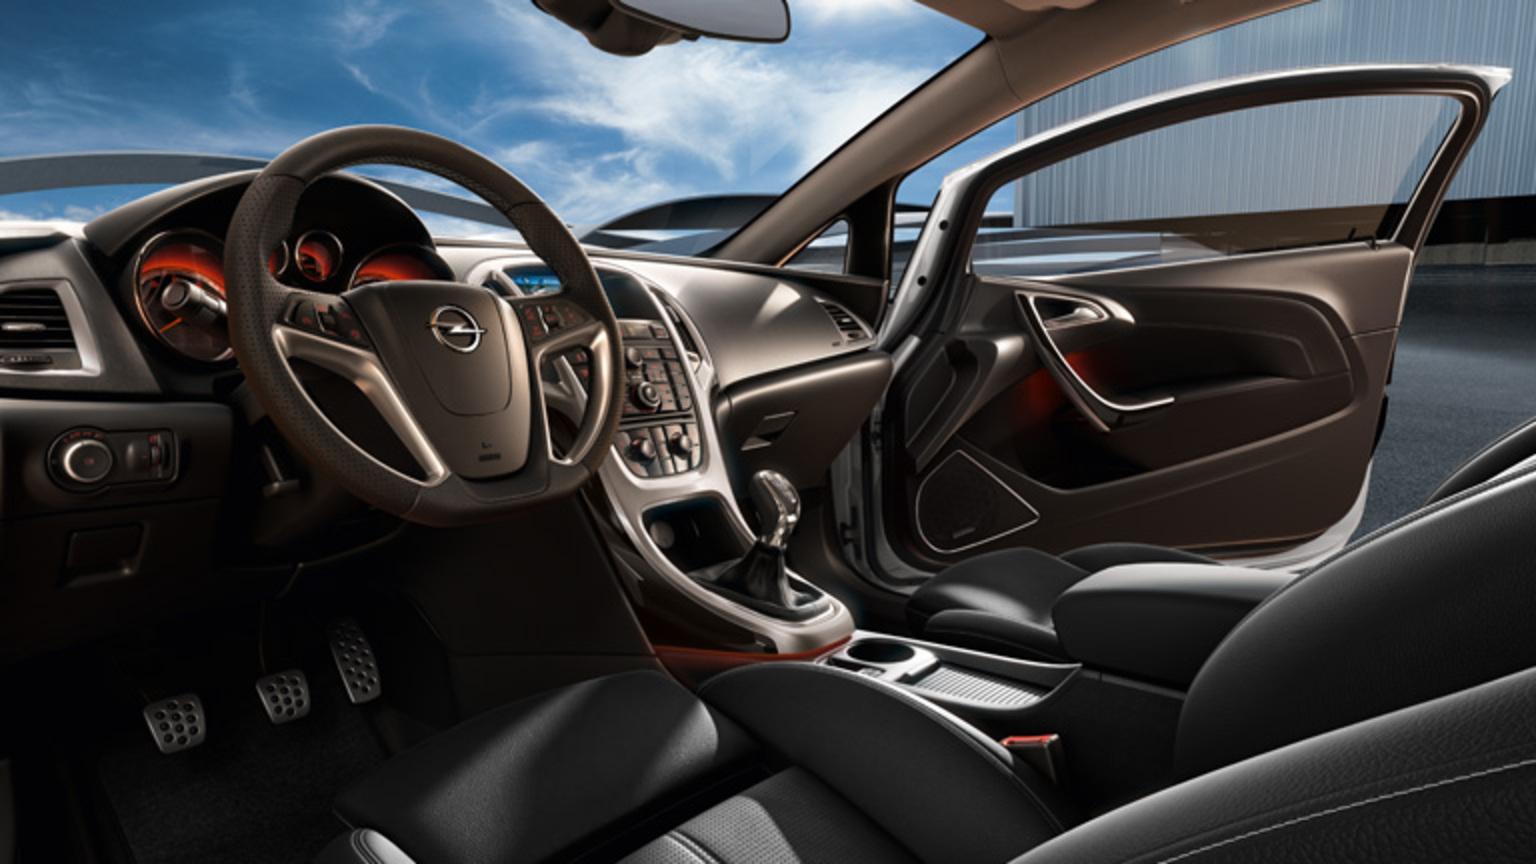 Topworldauto Photos Of Opel Astra Gtc Photo Galleries